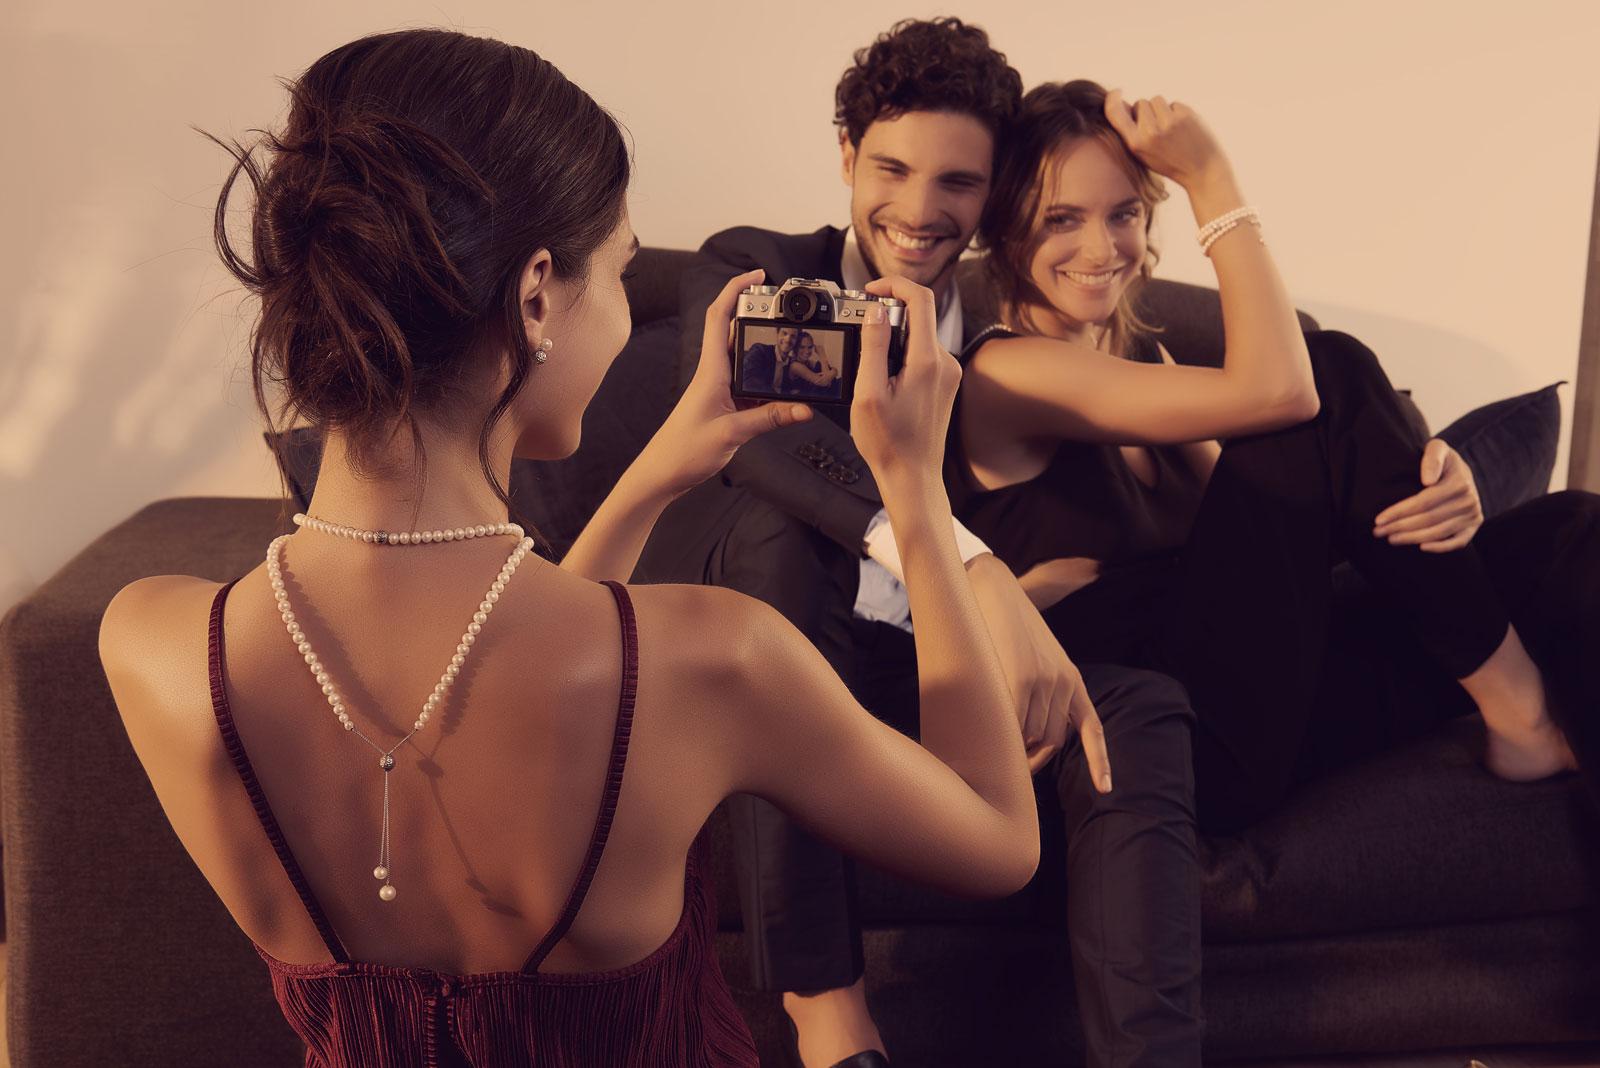 Miluna gioielli Mirko Burin Fashion stylist 10